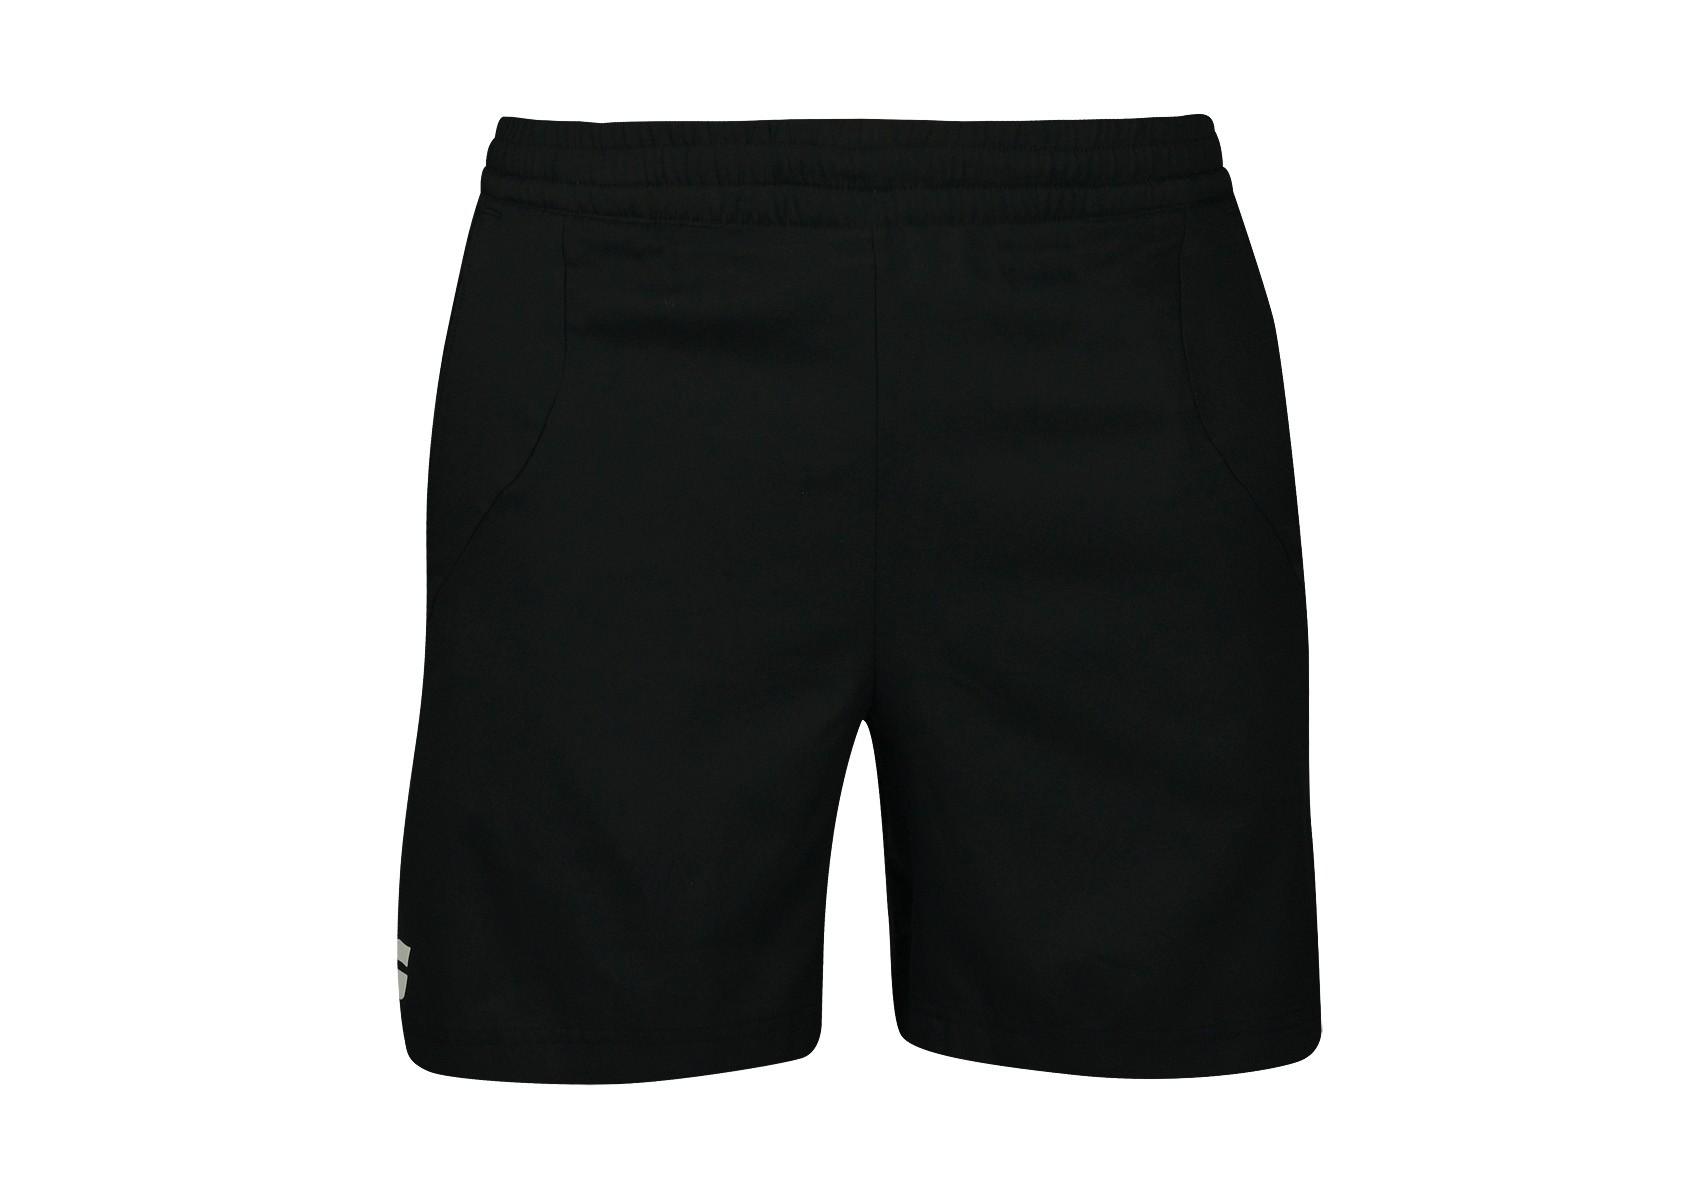 Spodenki tenisowe chłopięce Babolat CORE Short Black -45%